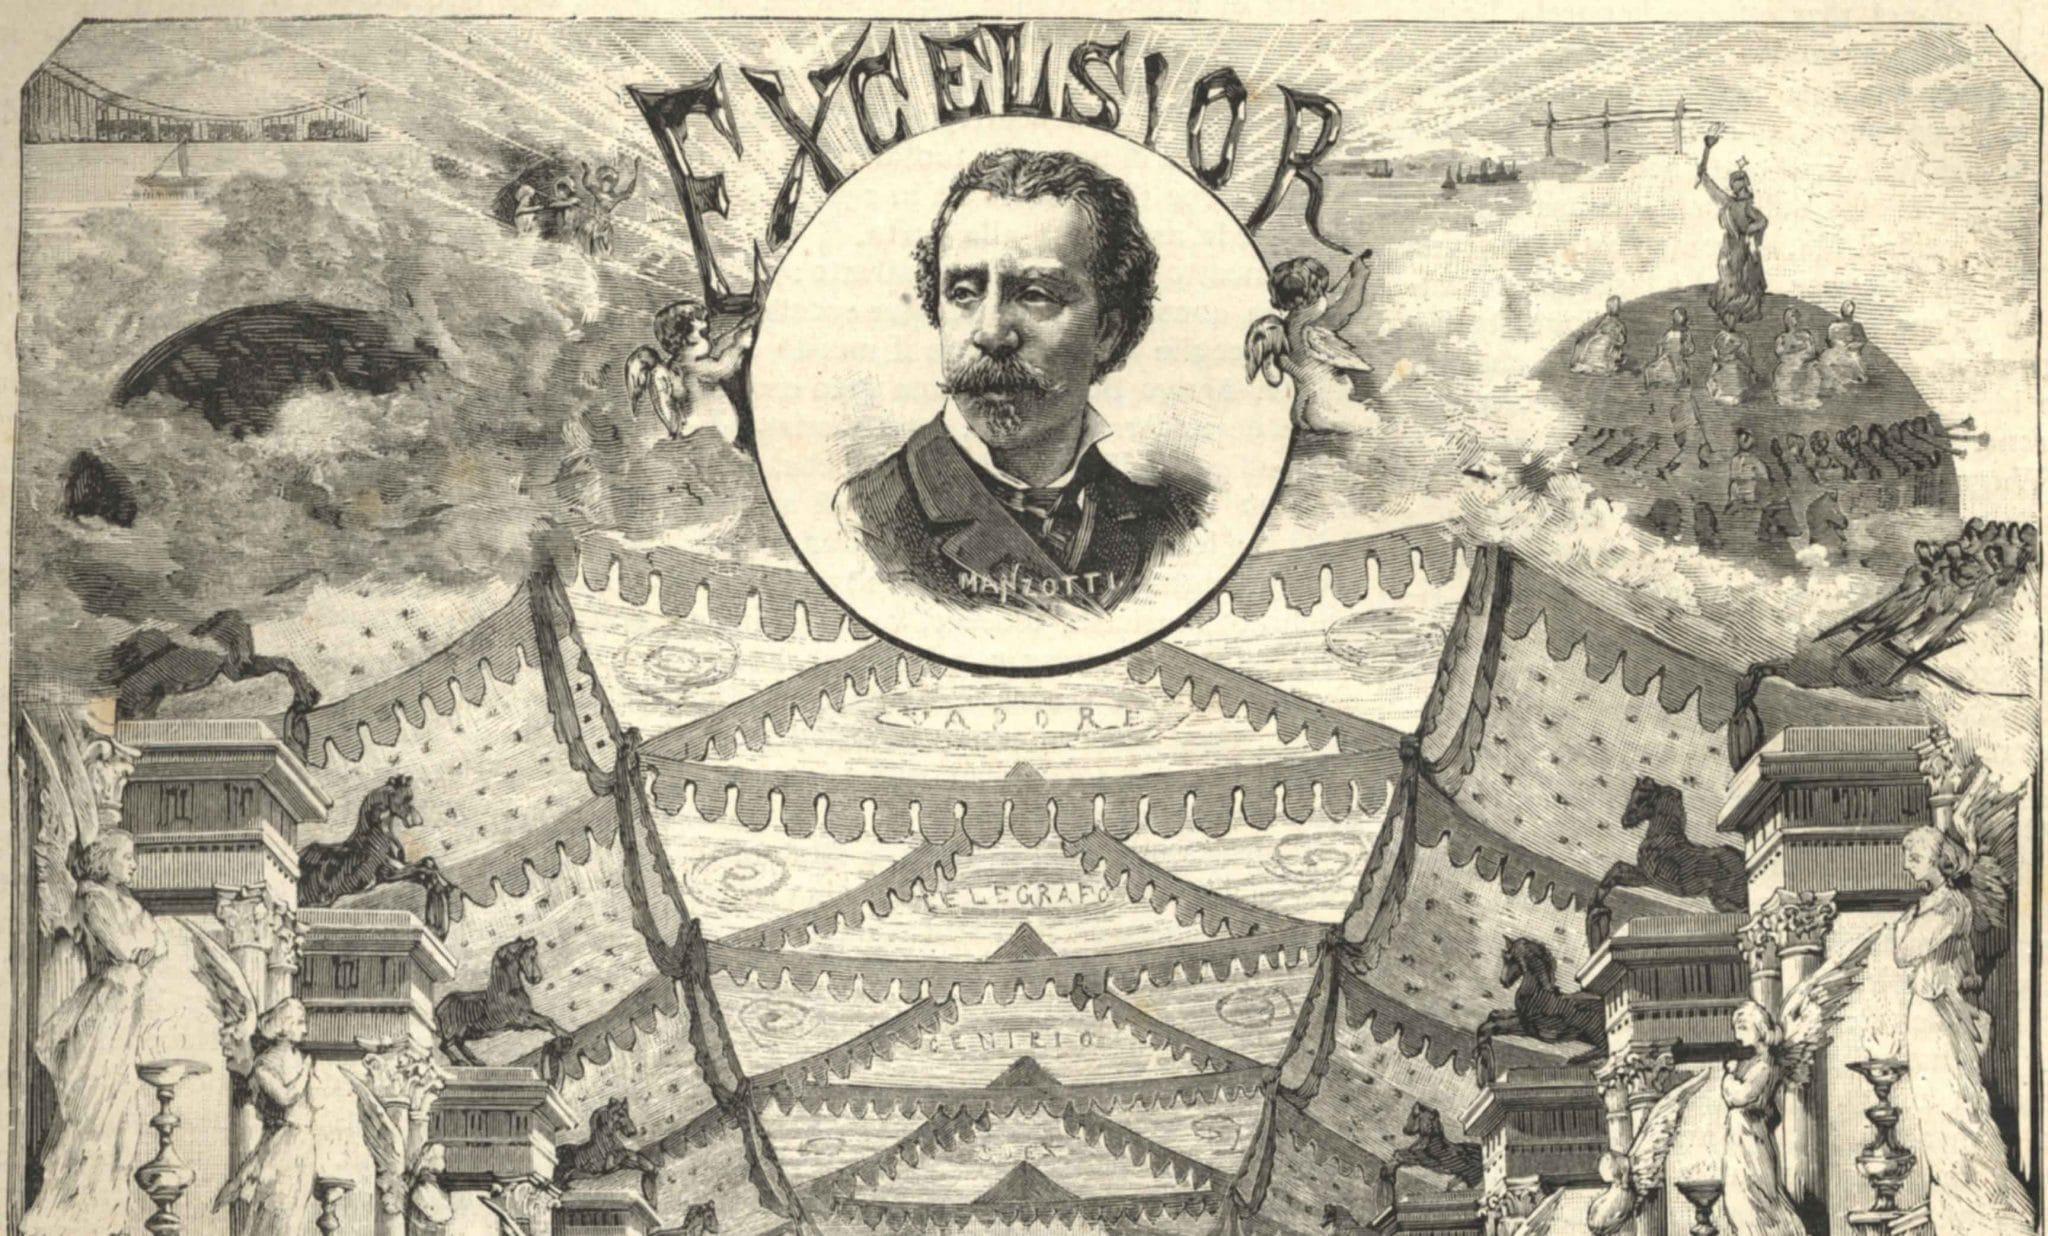 1884 Teatro Costanzi